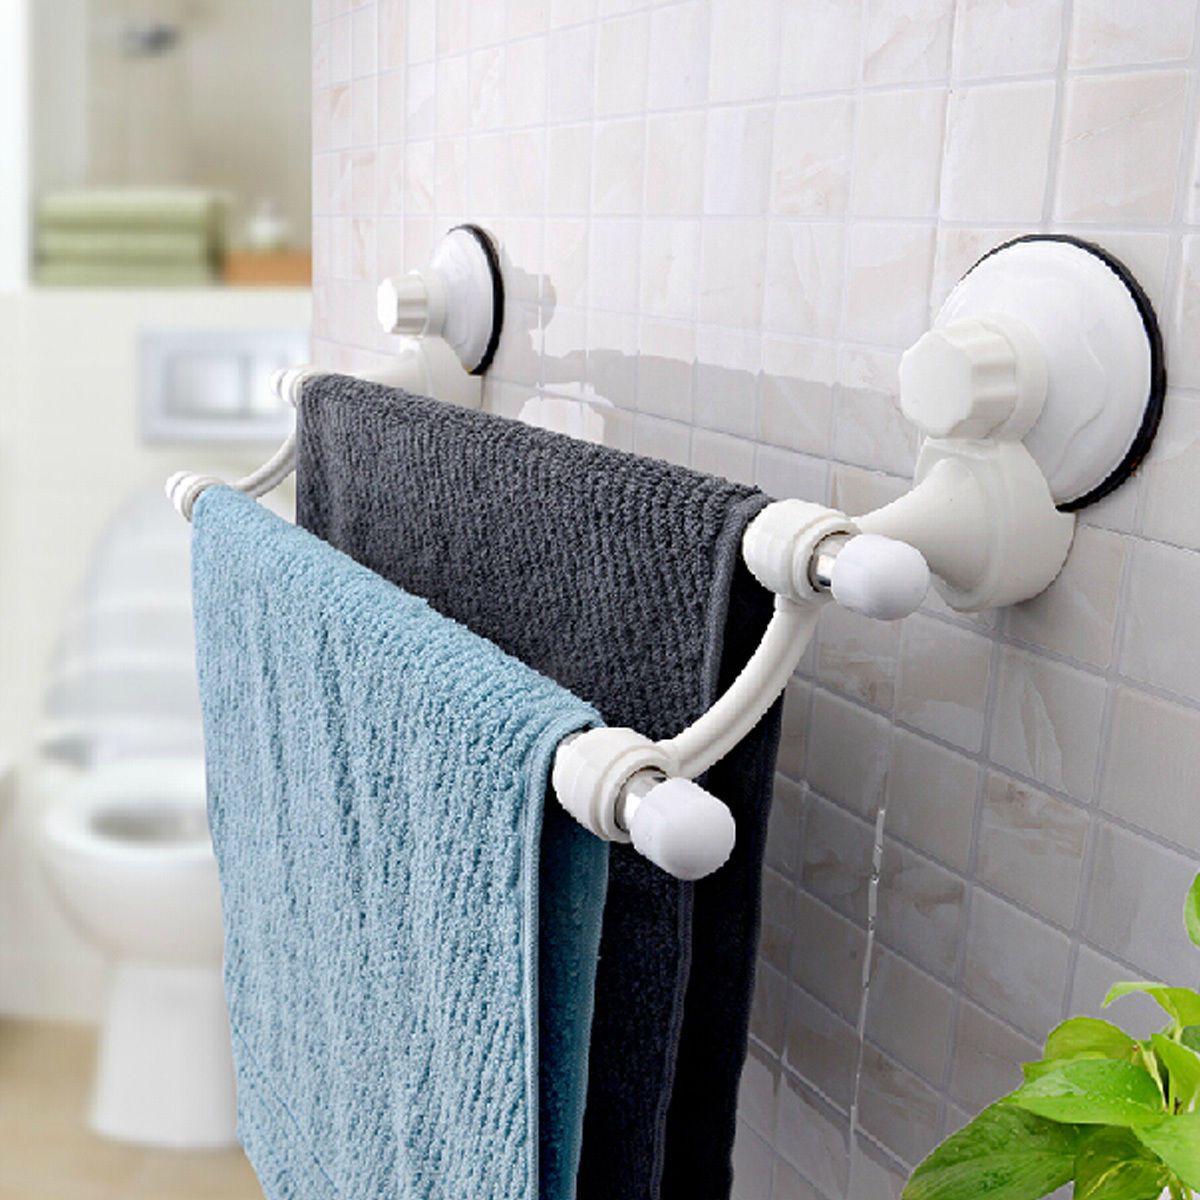 $13.17 AUD - Bathroom Kitchen Suction Cup Double Towel Rack Rail ...